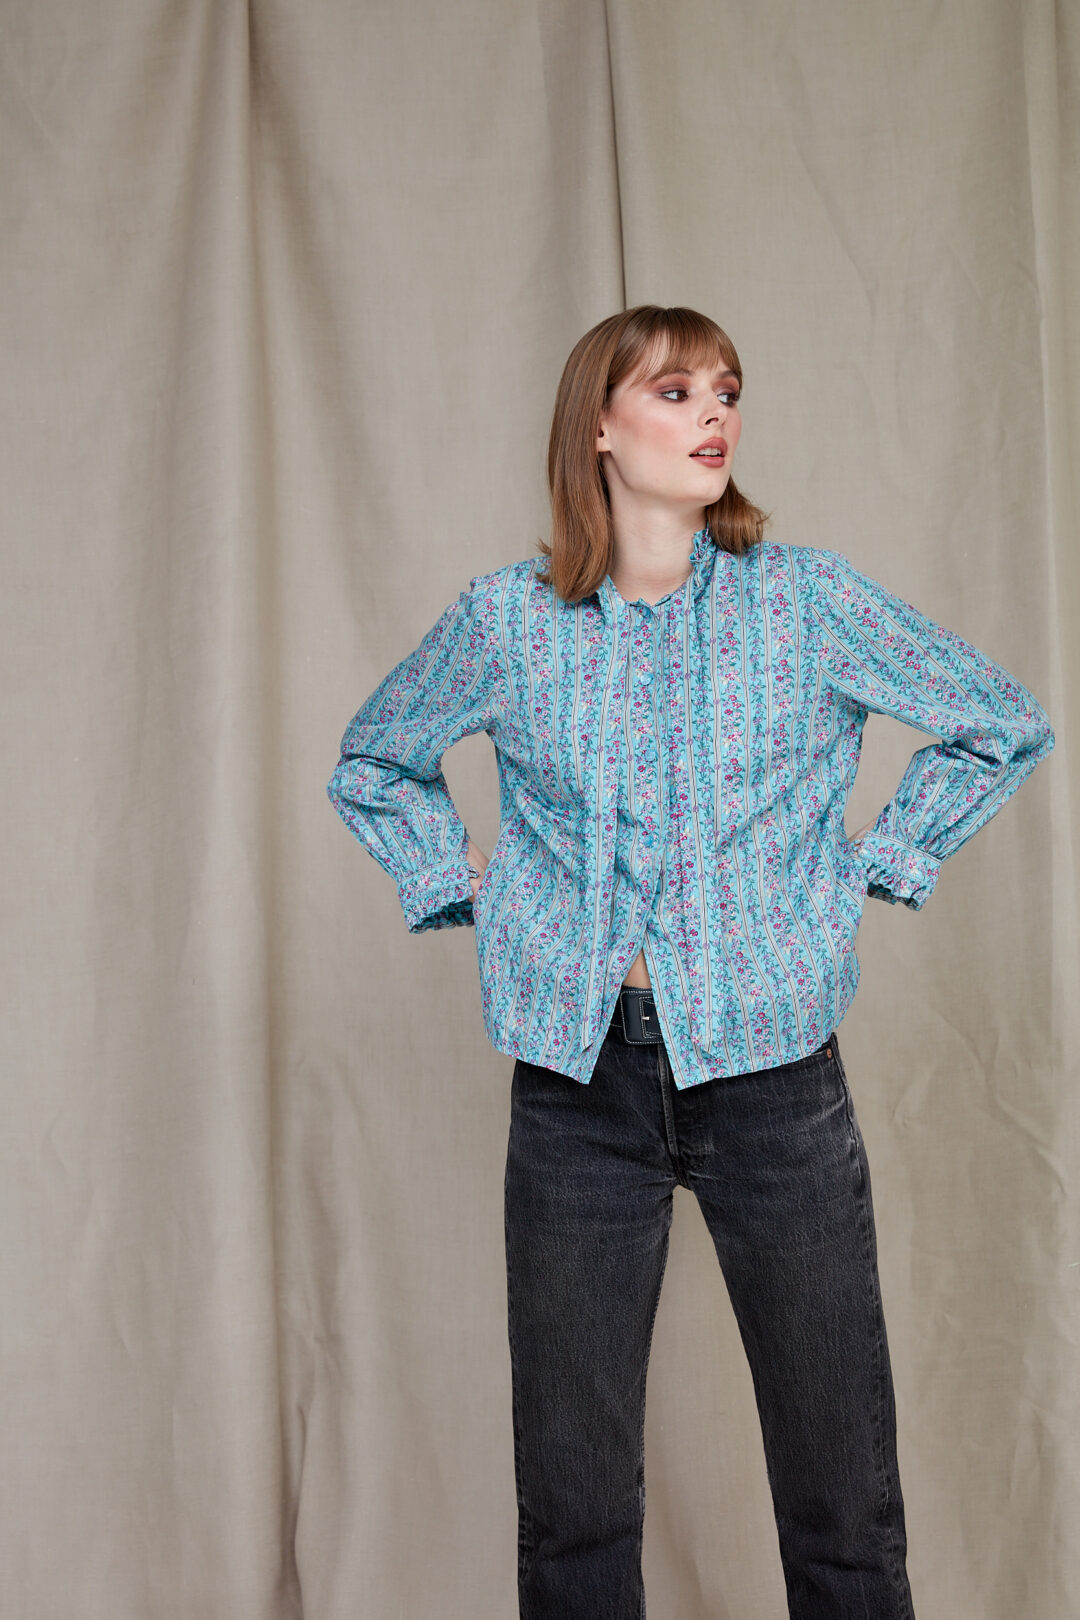 collect23 silk shirt